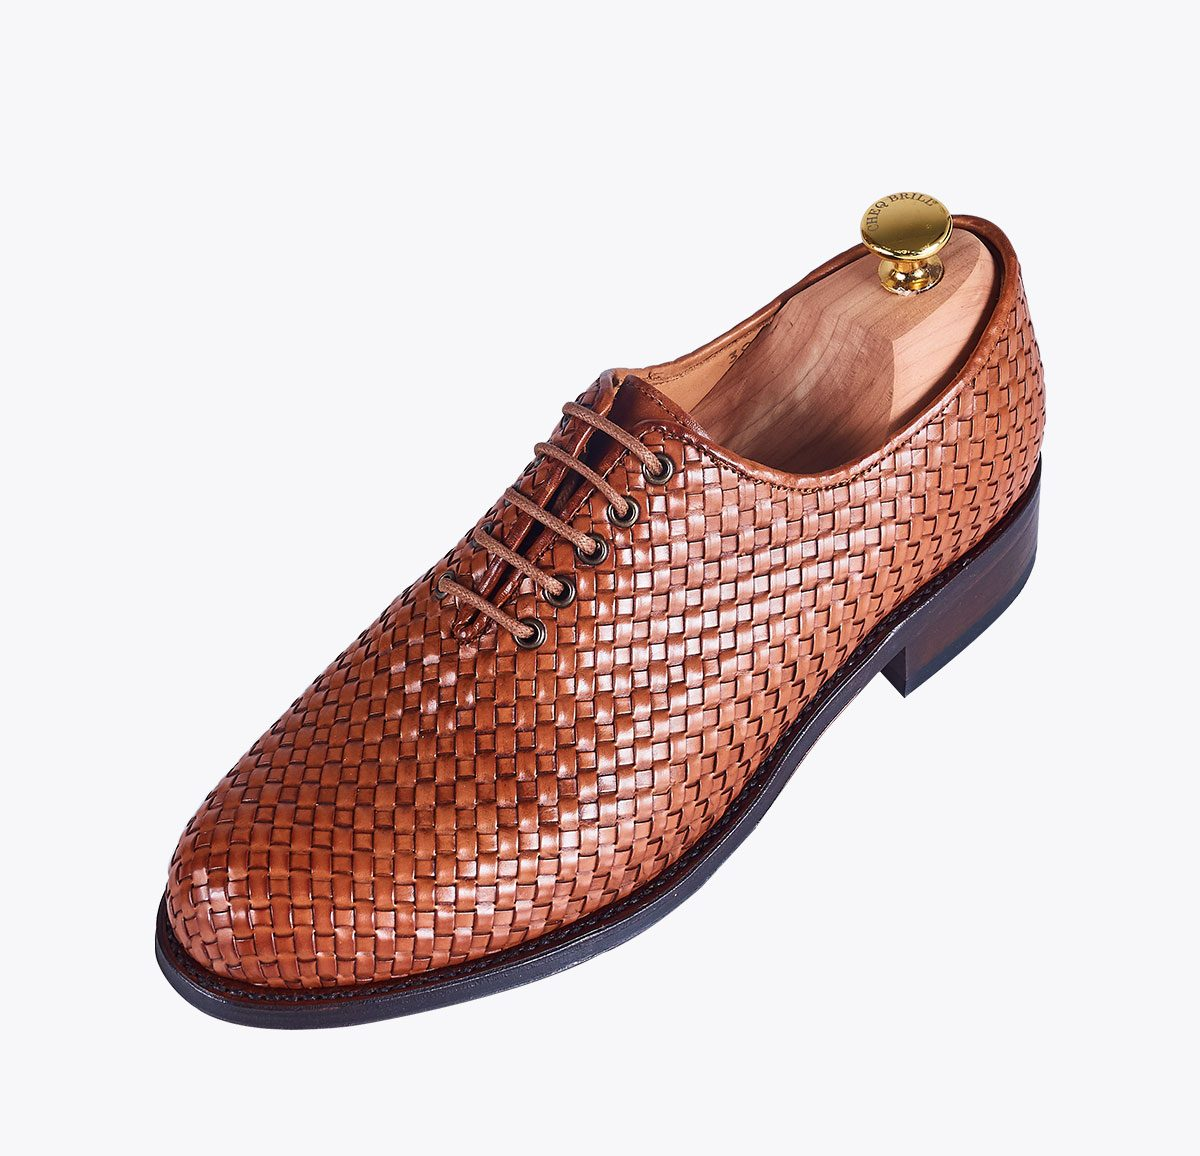 Zapato trenzado cuero mandalashoes Santanyí Mallorca